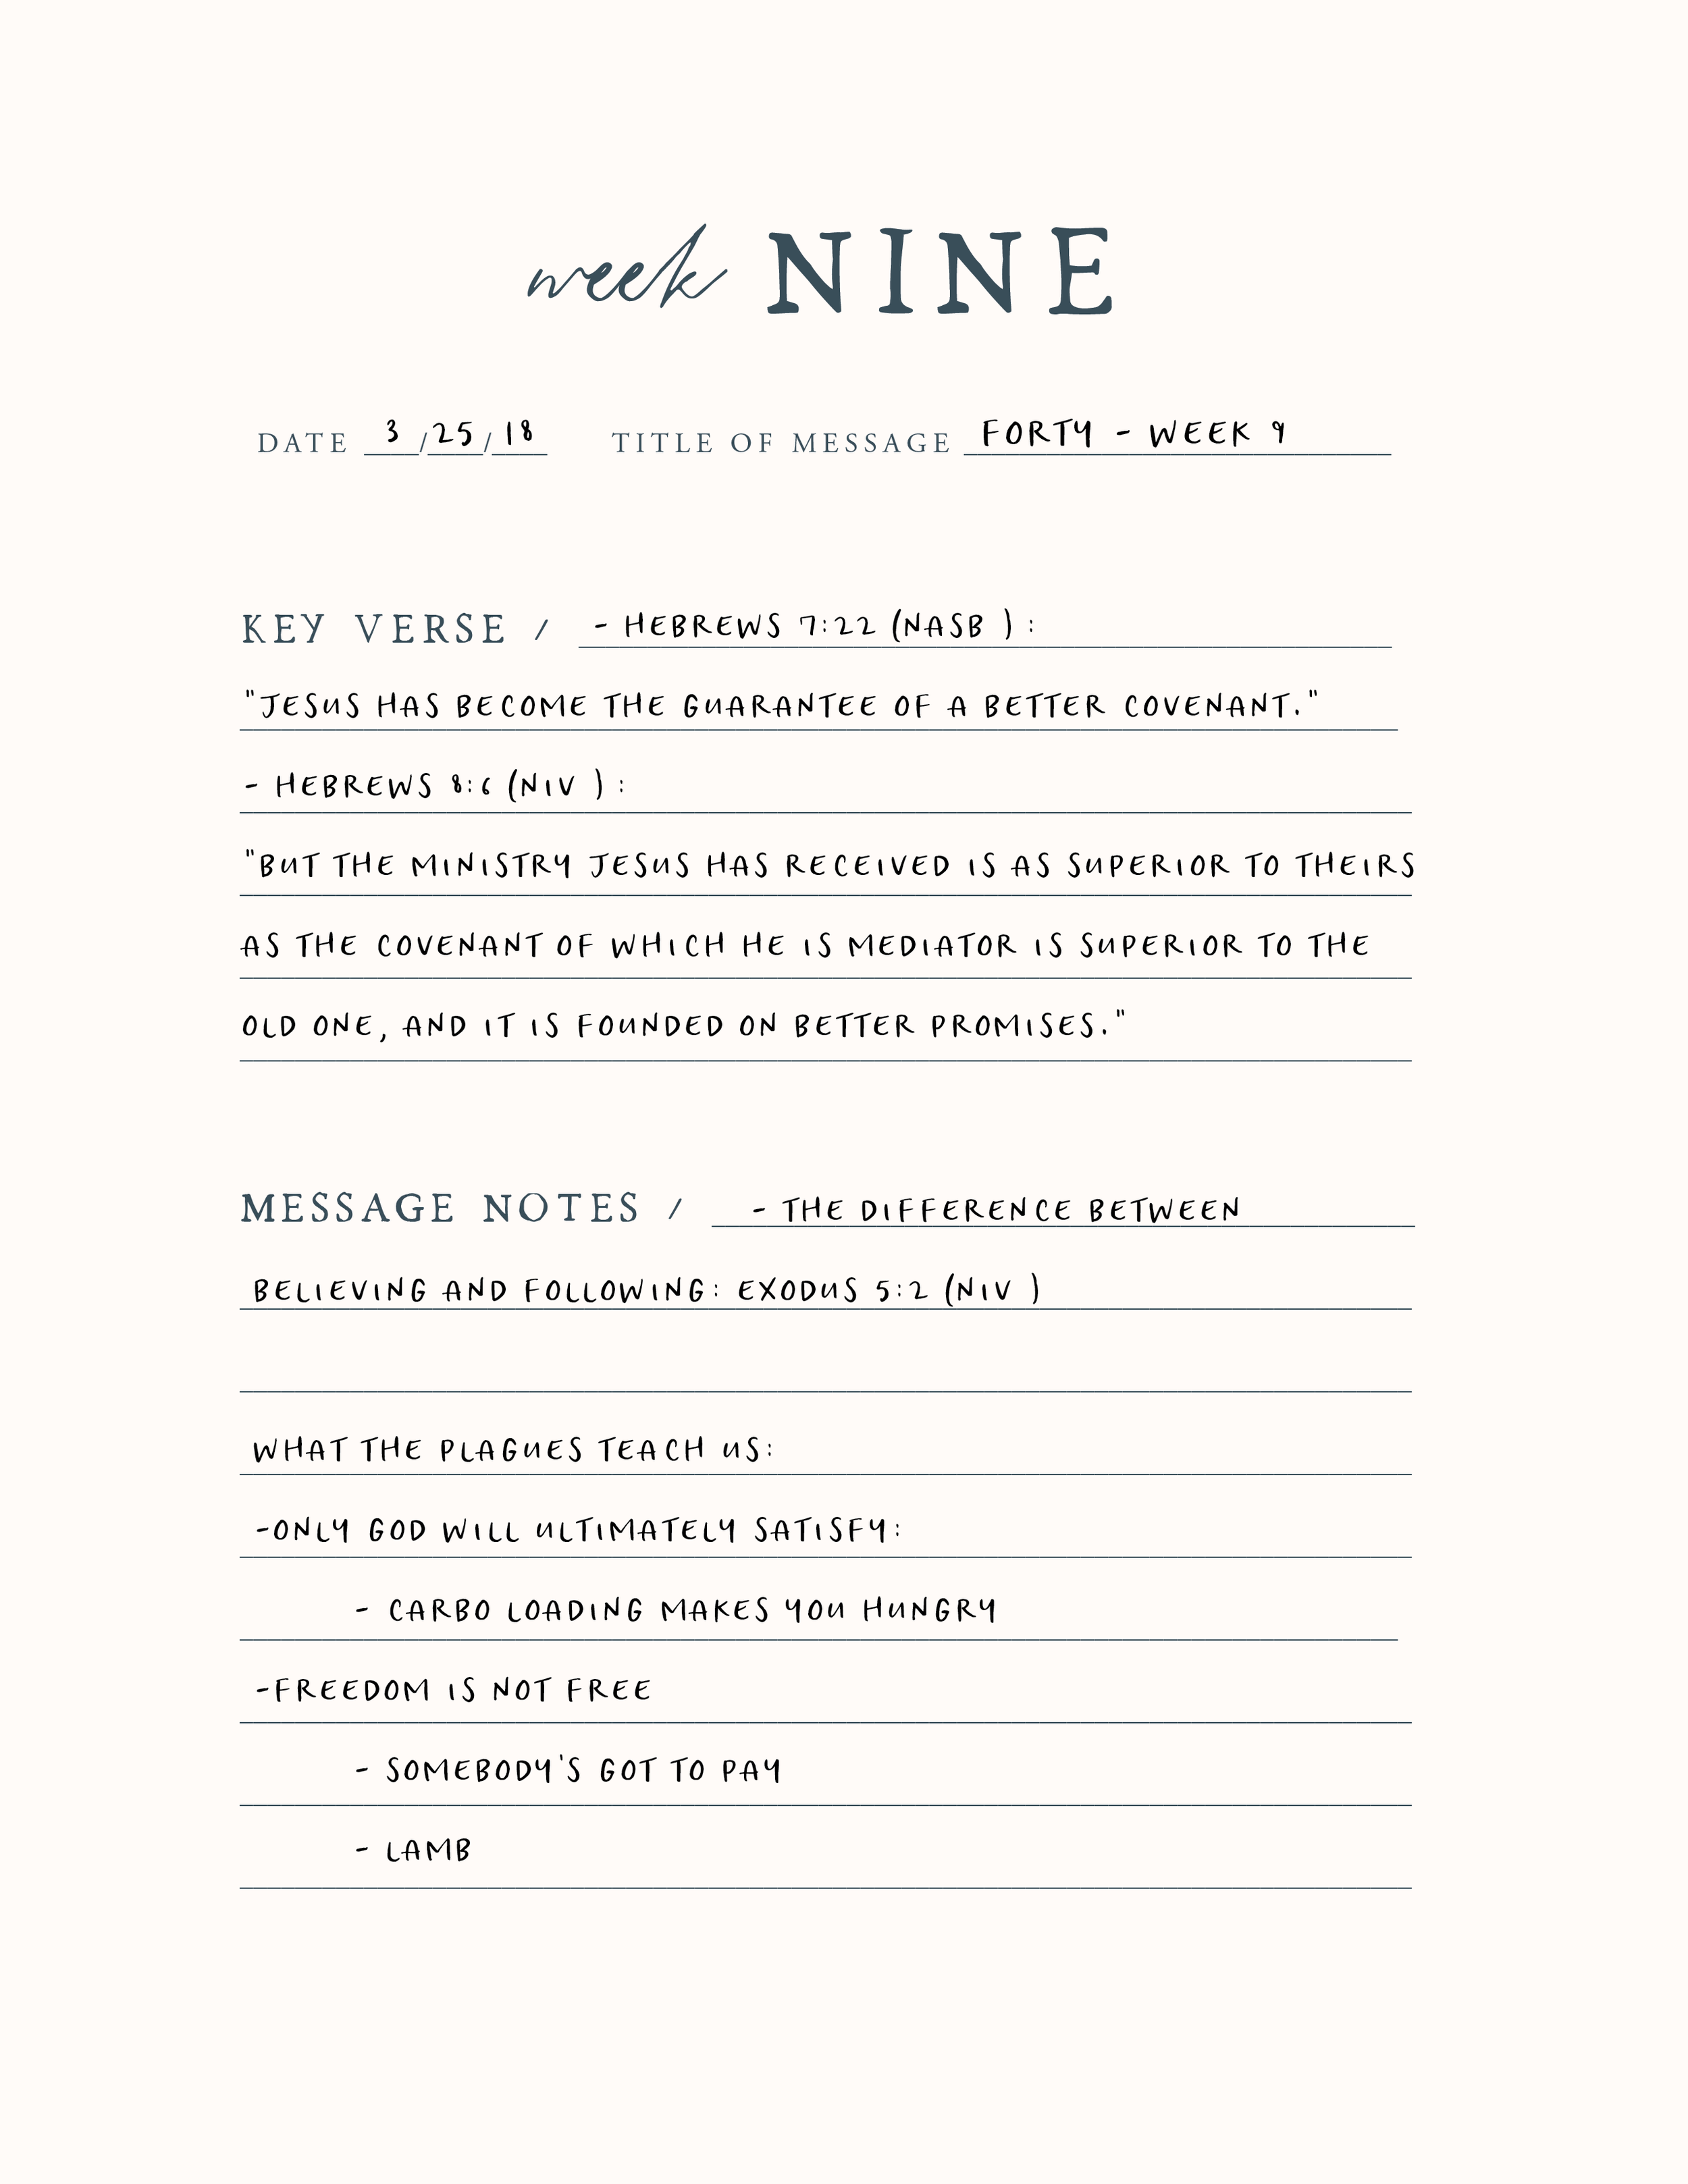 weeknine_notes.png